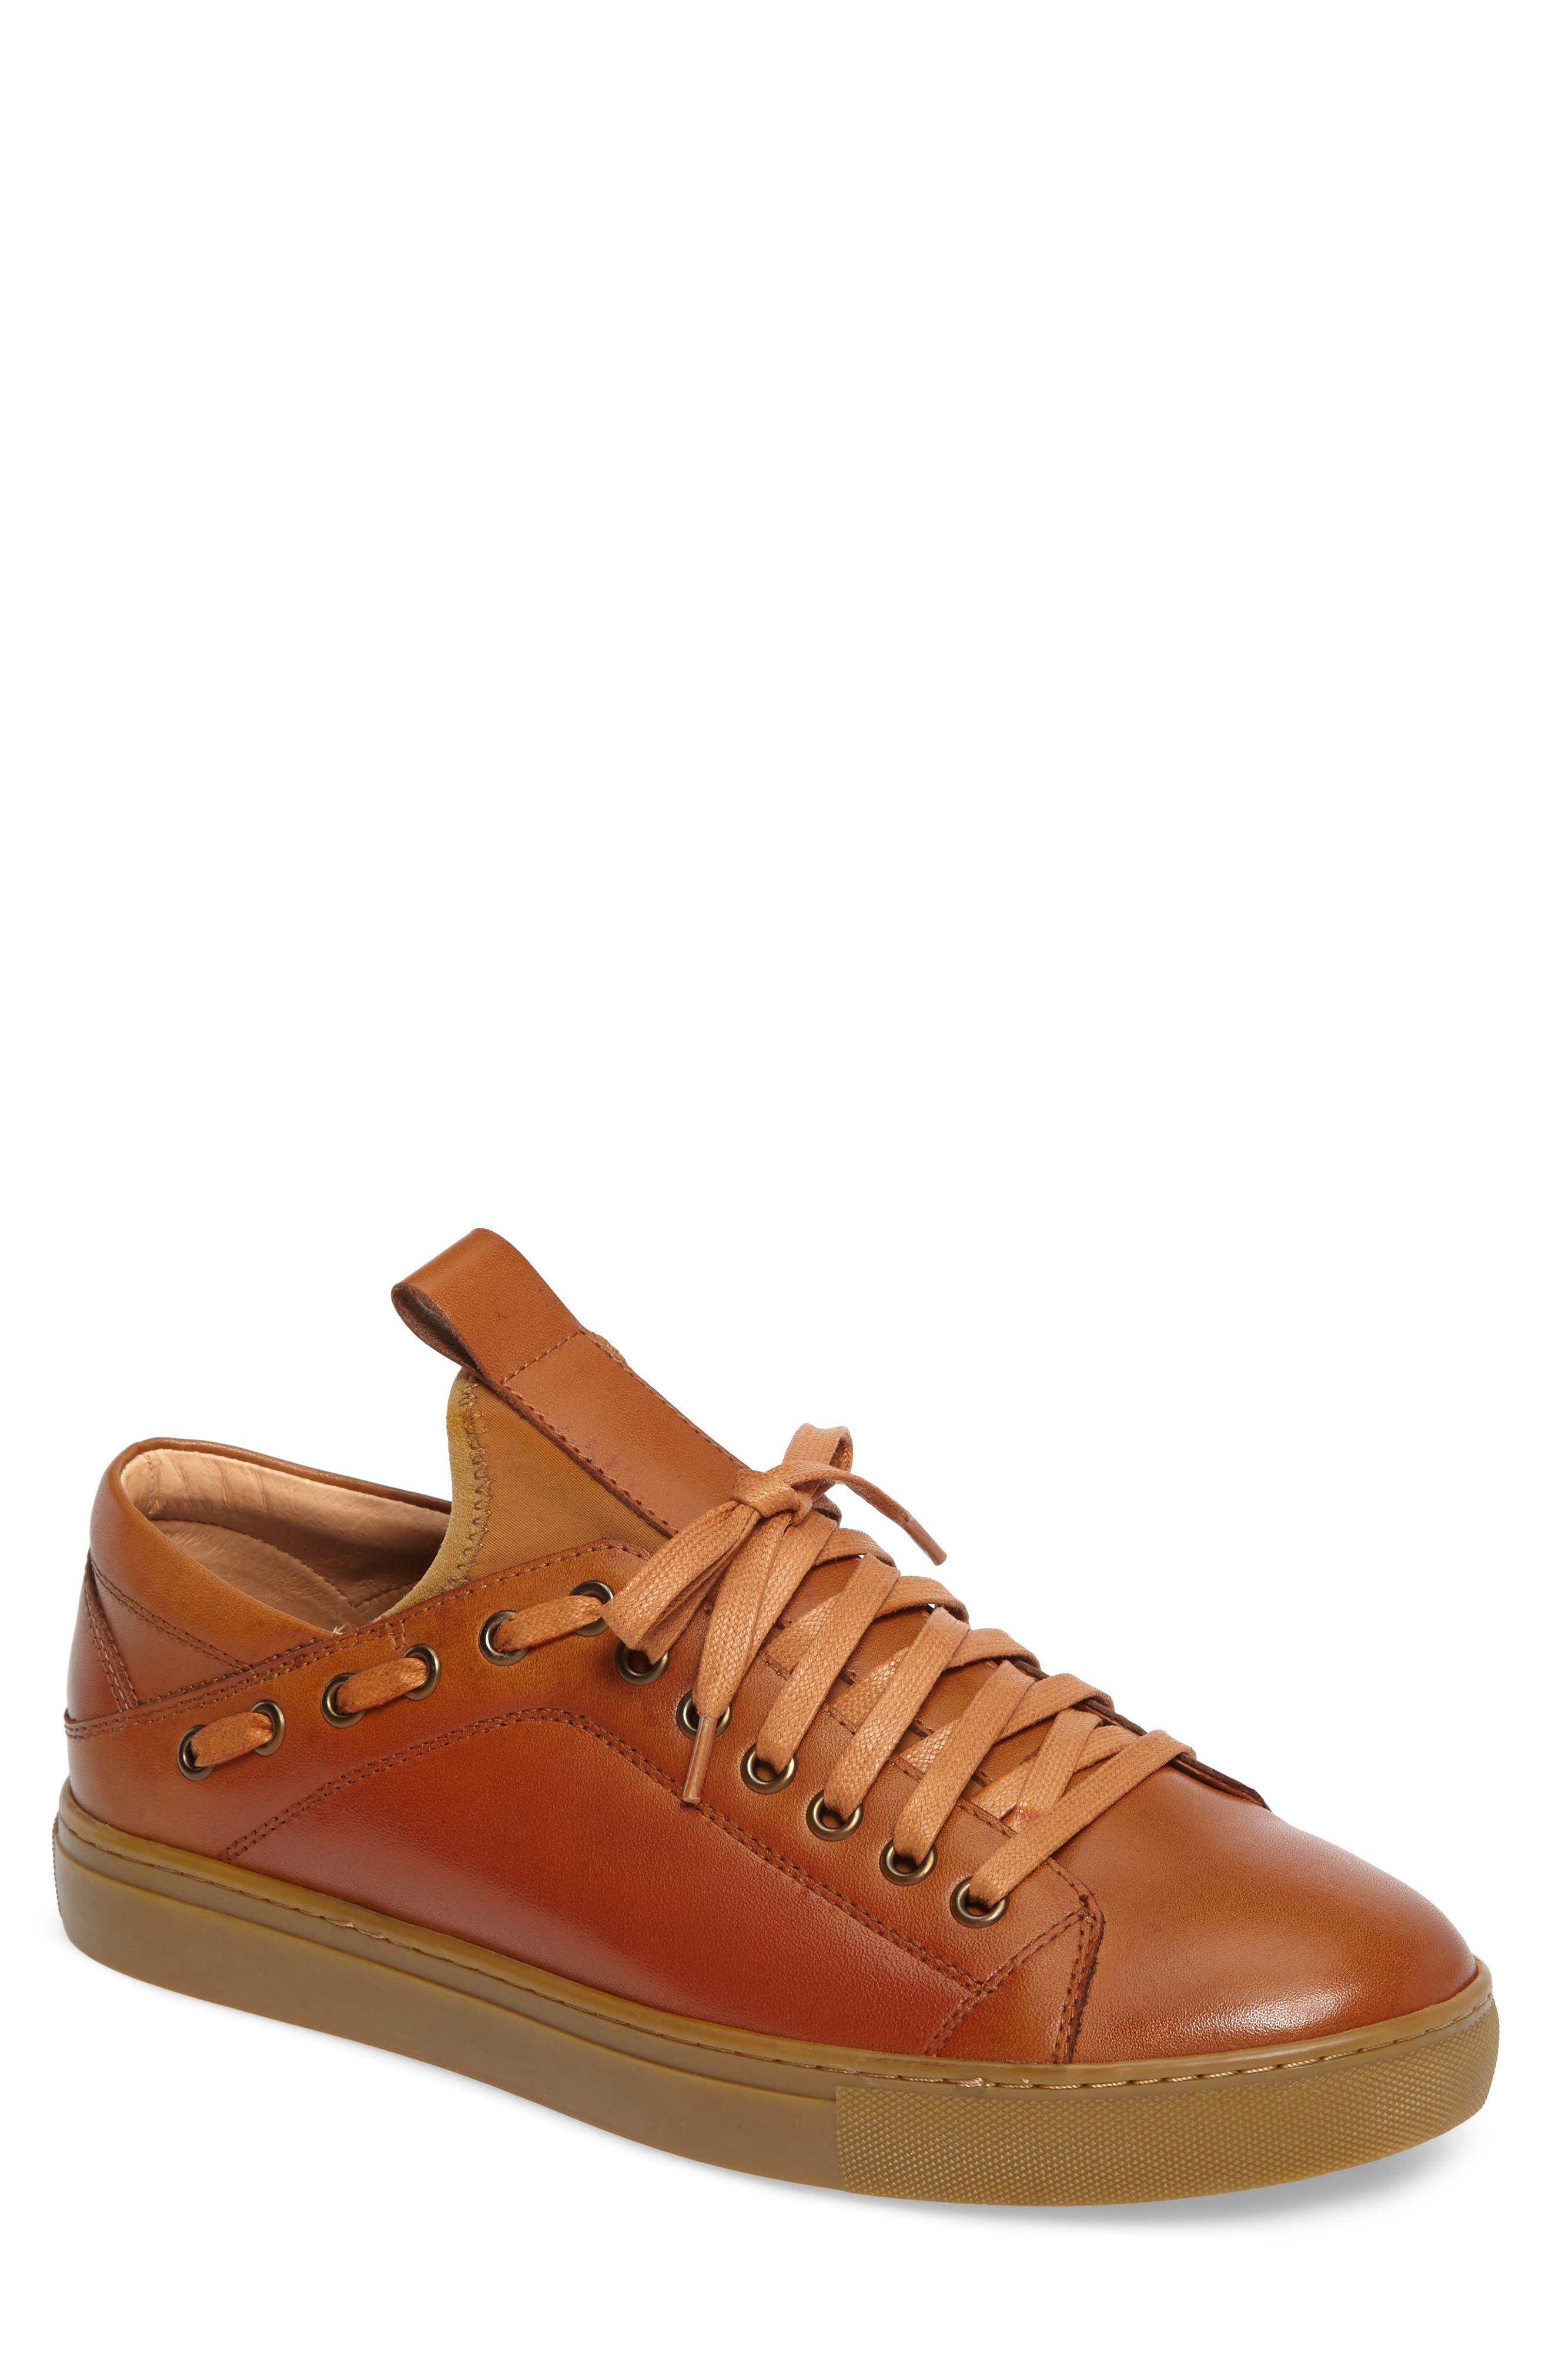 Alternate Image 1 Selected - Zanzara Owen Sneaker (Men)